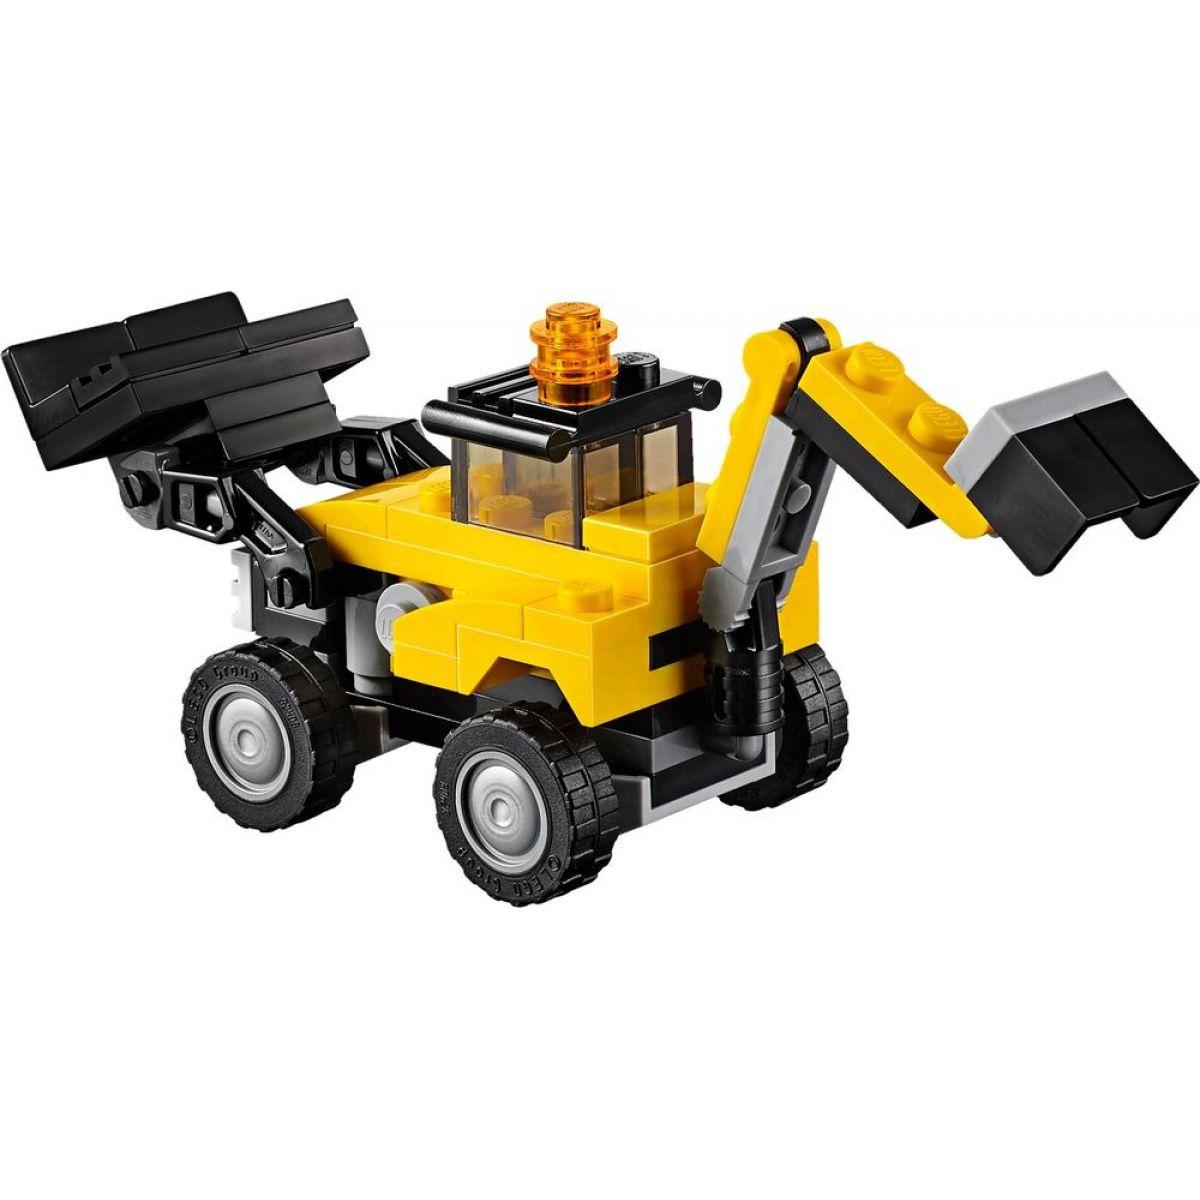 LEGO Creator 31041 Vozidla na stavbě #3